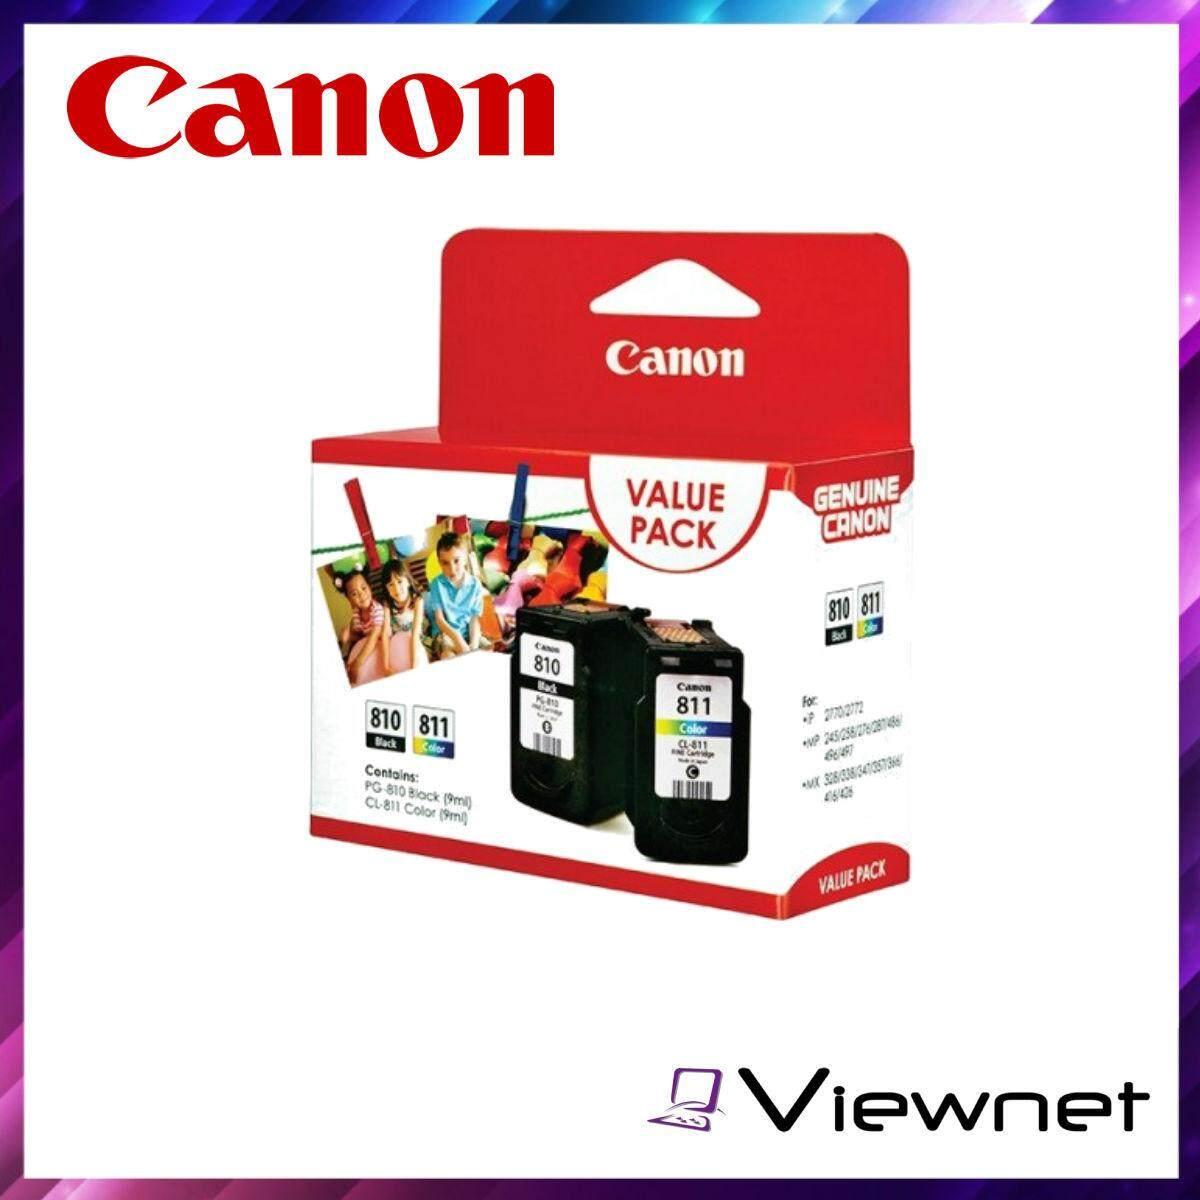 Canon Cartridge PG-810+CL-811 Value Pack Ink (Black+Tri-Color)